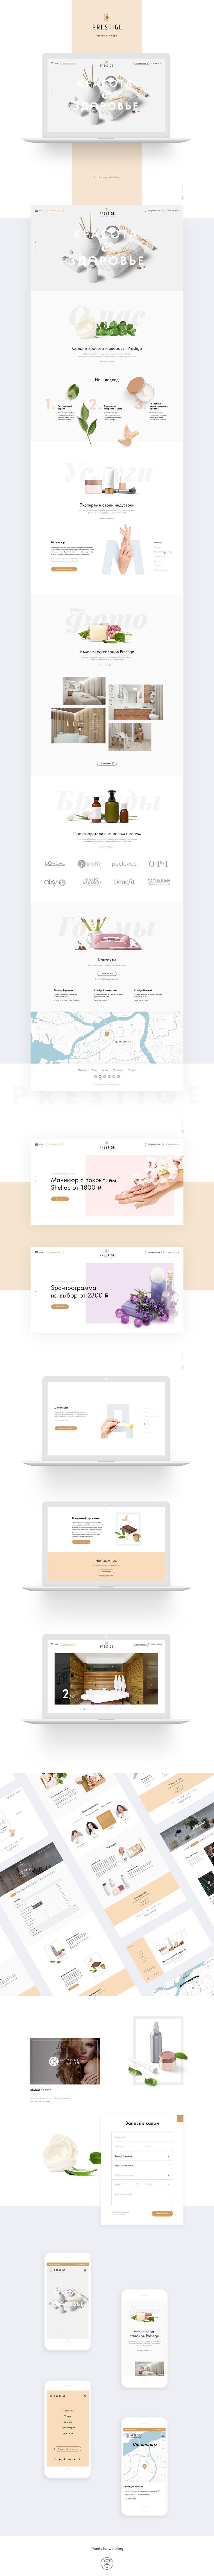 Beauty & Spa salon Presige website. Art Direction, Design. 2016.Watch live: prestige-expert.ru https://xtremefreelance.com/